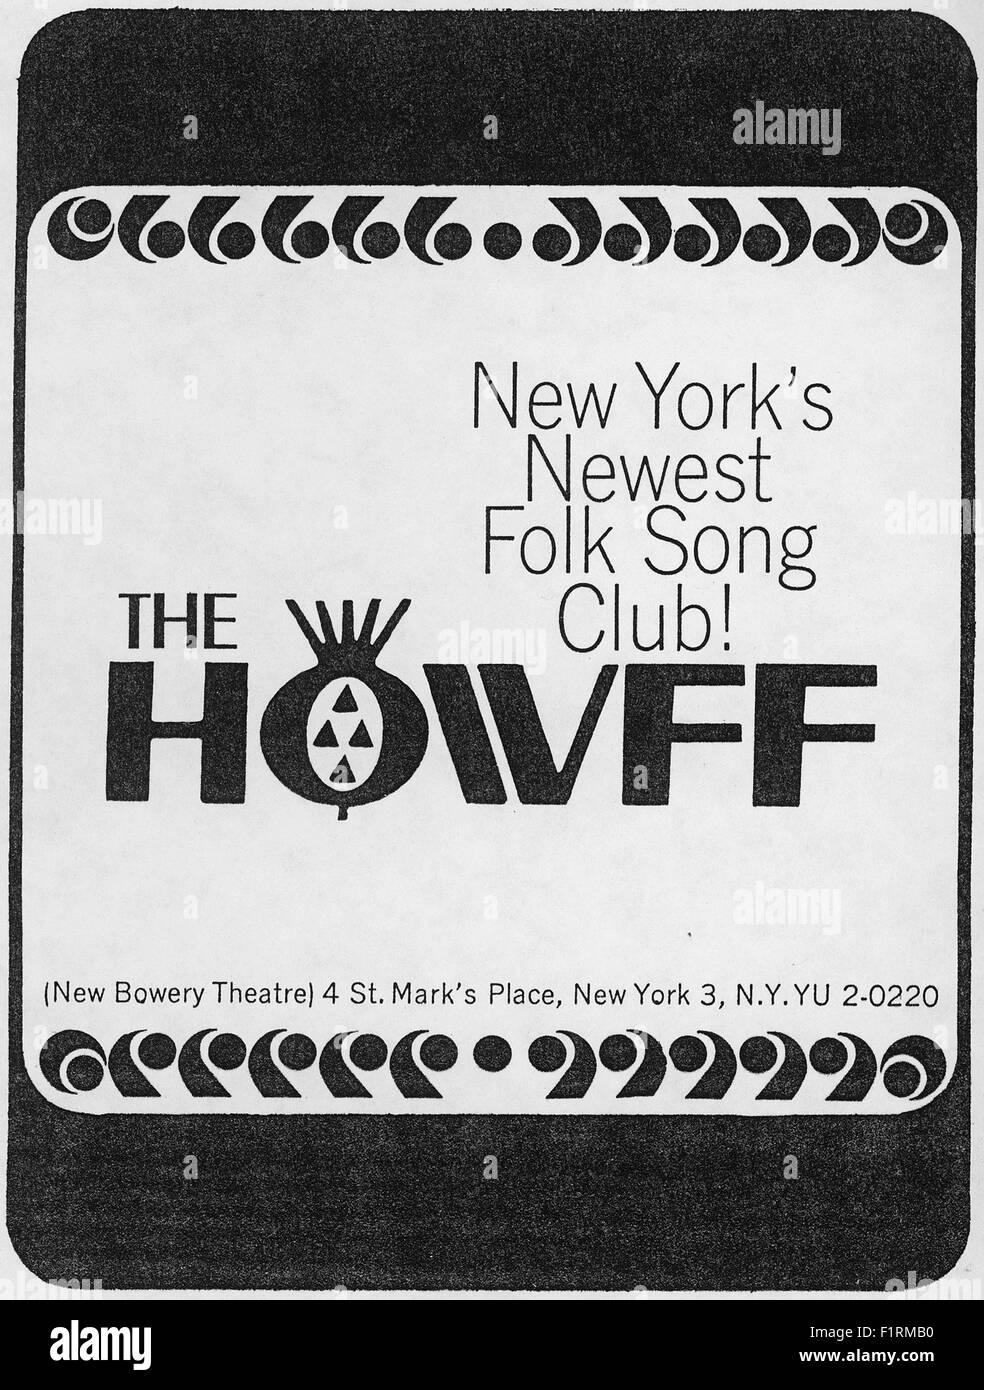 FOLK MUSIC EPHEMERA, circa 1960s. PRINT AD FOR FOLK MUSIC CLUB THE HOWFF. Courtesy Granaamour Weems Collection. - Stock Image